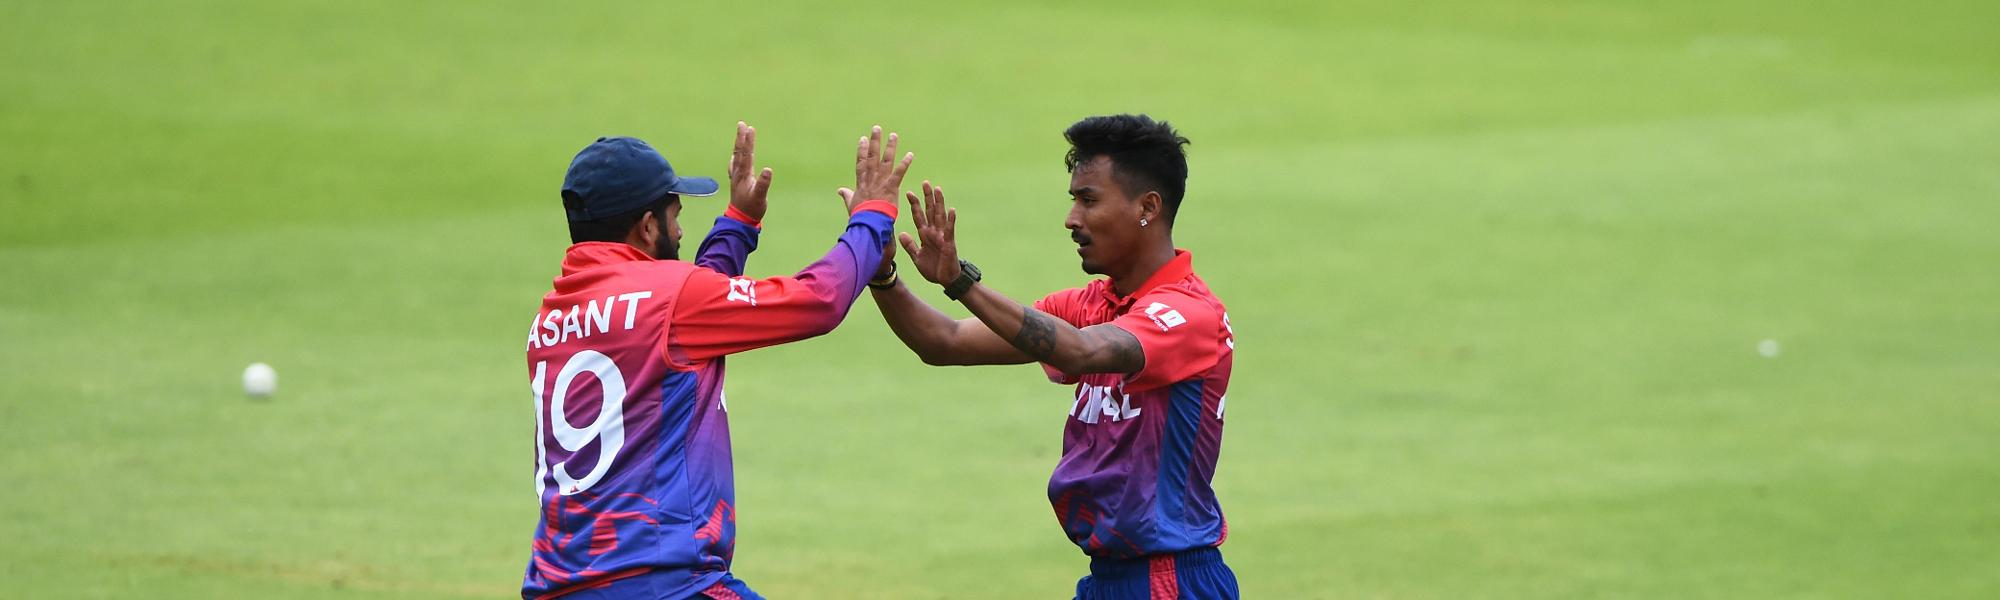 Nepal celebrate